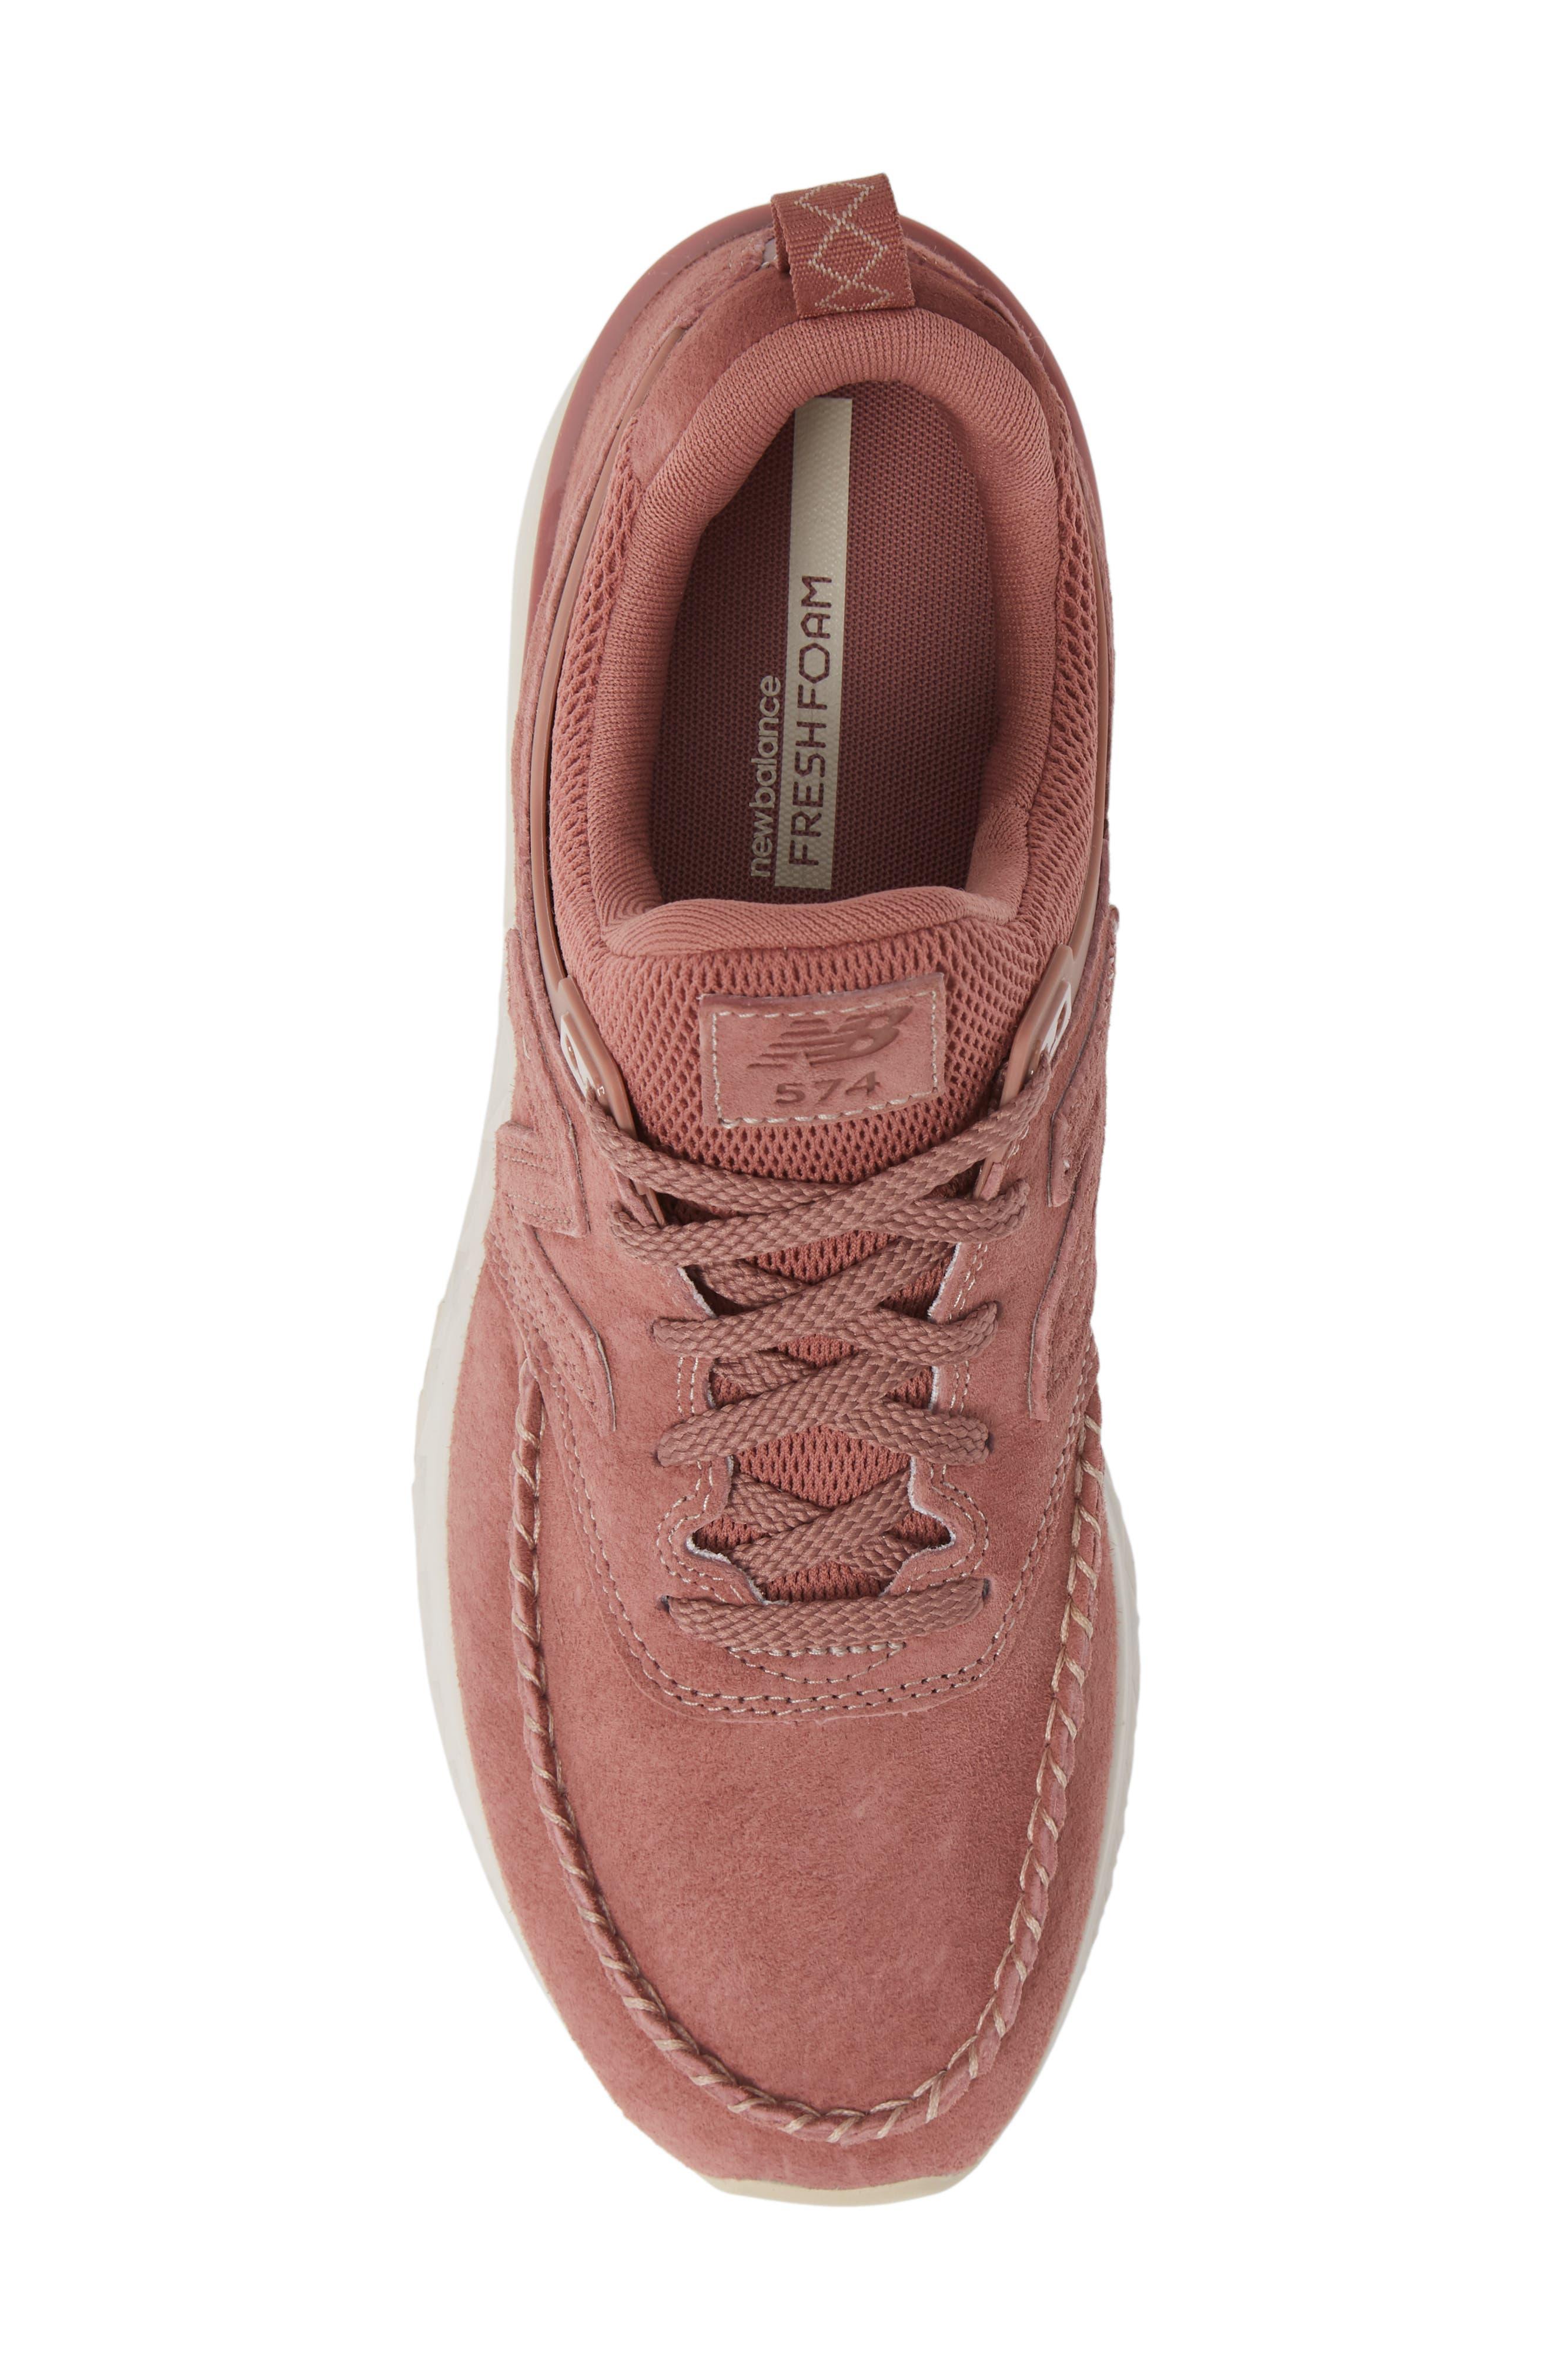 574 Sport Sneaker,                             Alternate thumbnail 5, color,                             DARK OXIDE SUEDE/ MESH